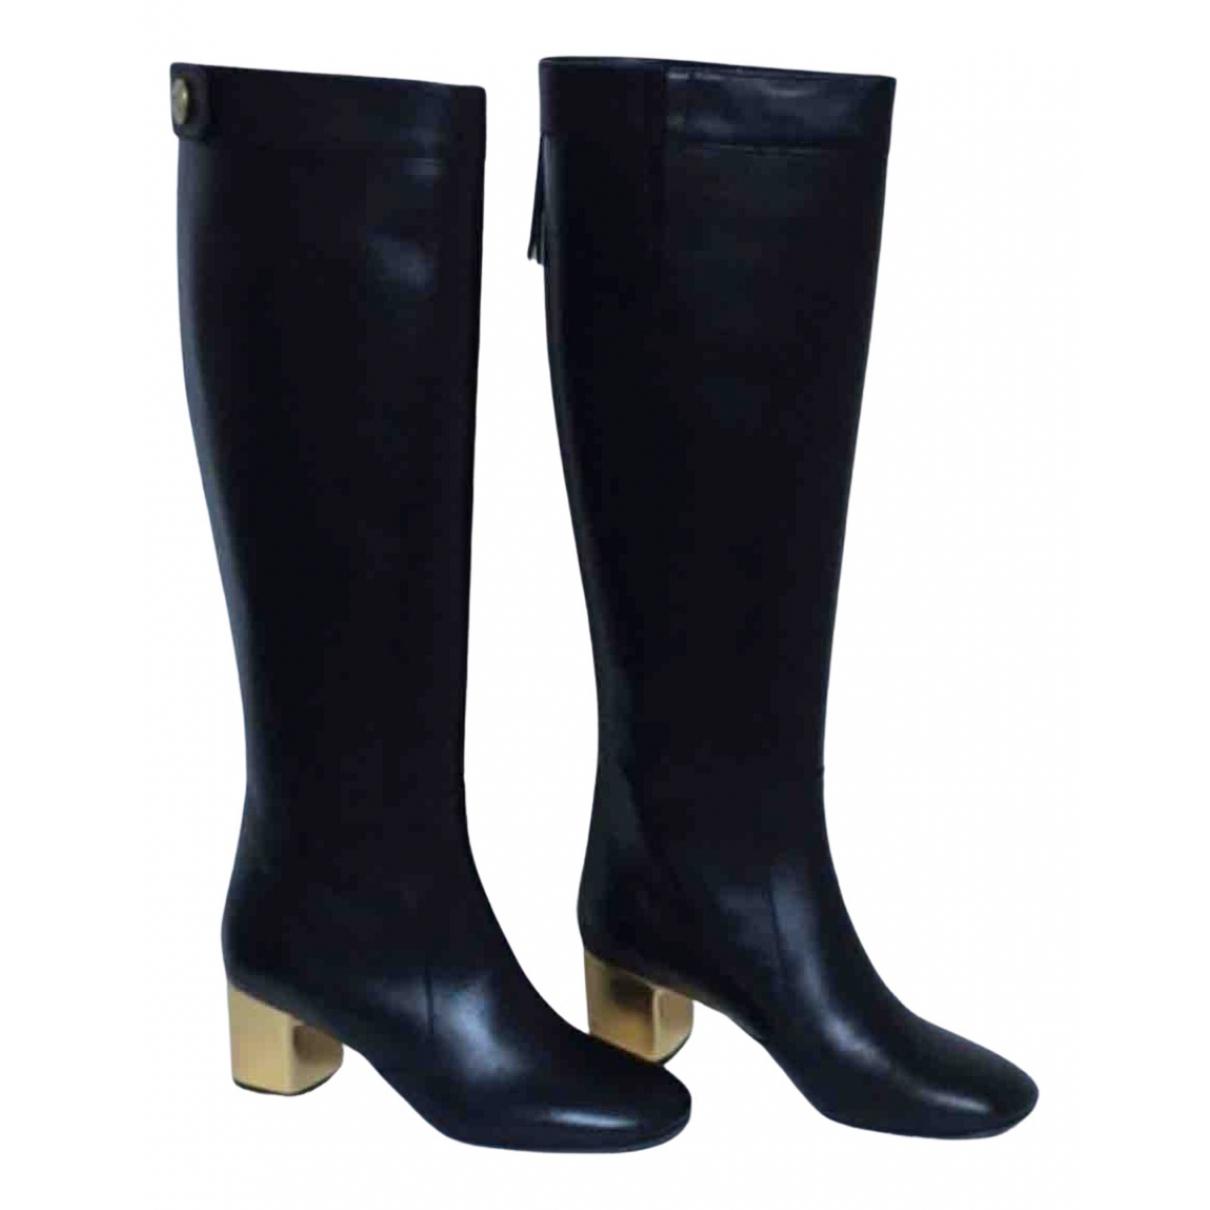 Celine N Black Leather Boots for Women 40 IT